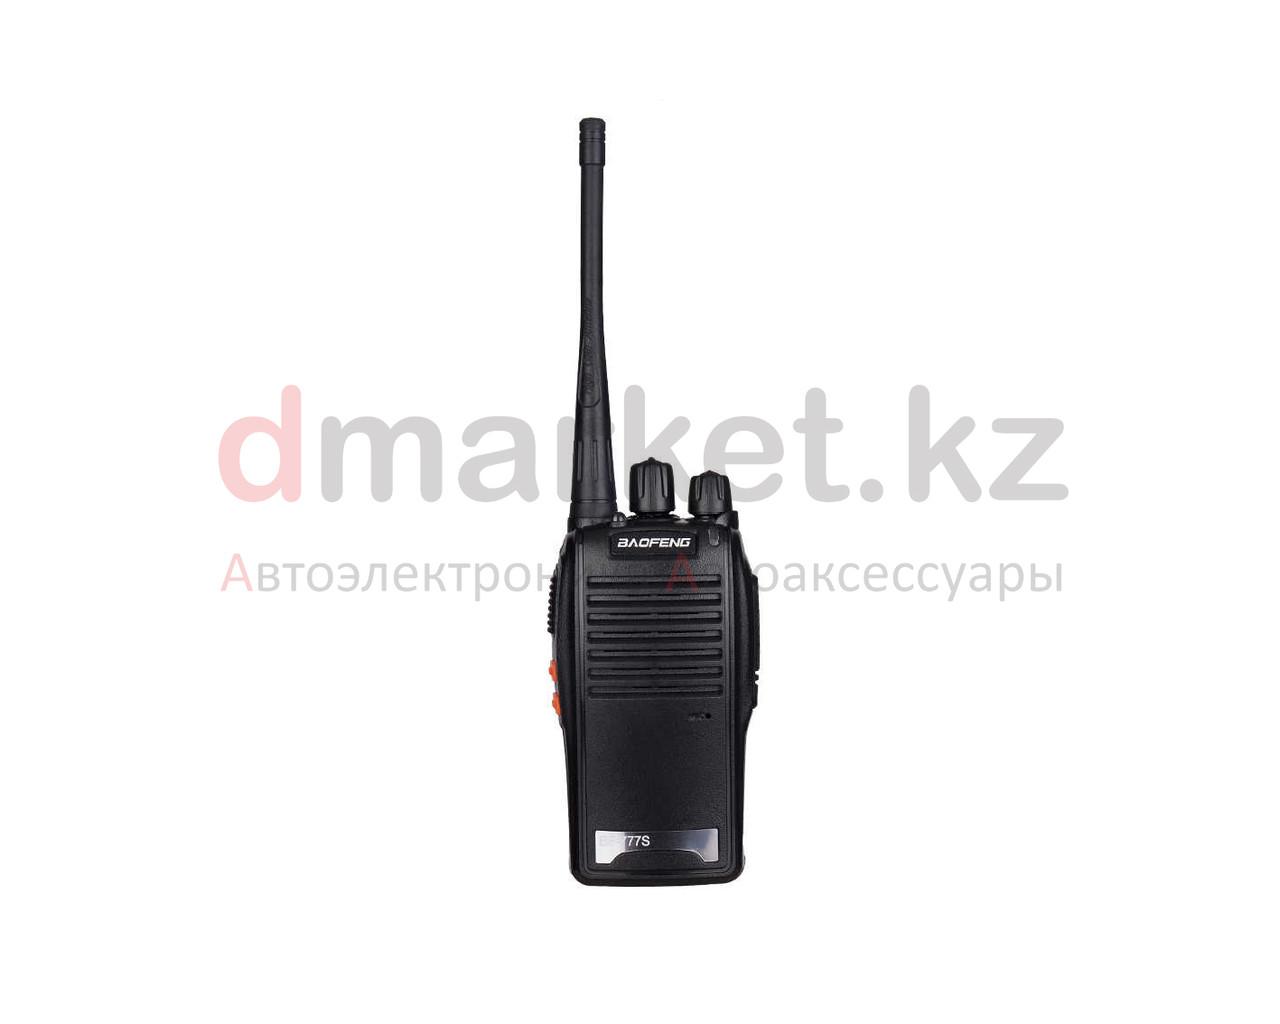 Baofeng BF-777S, 400-470МГц, 16 каналов, 1500 мАч, гарантия 6 месяцев